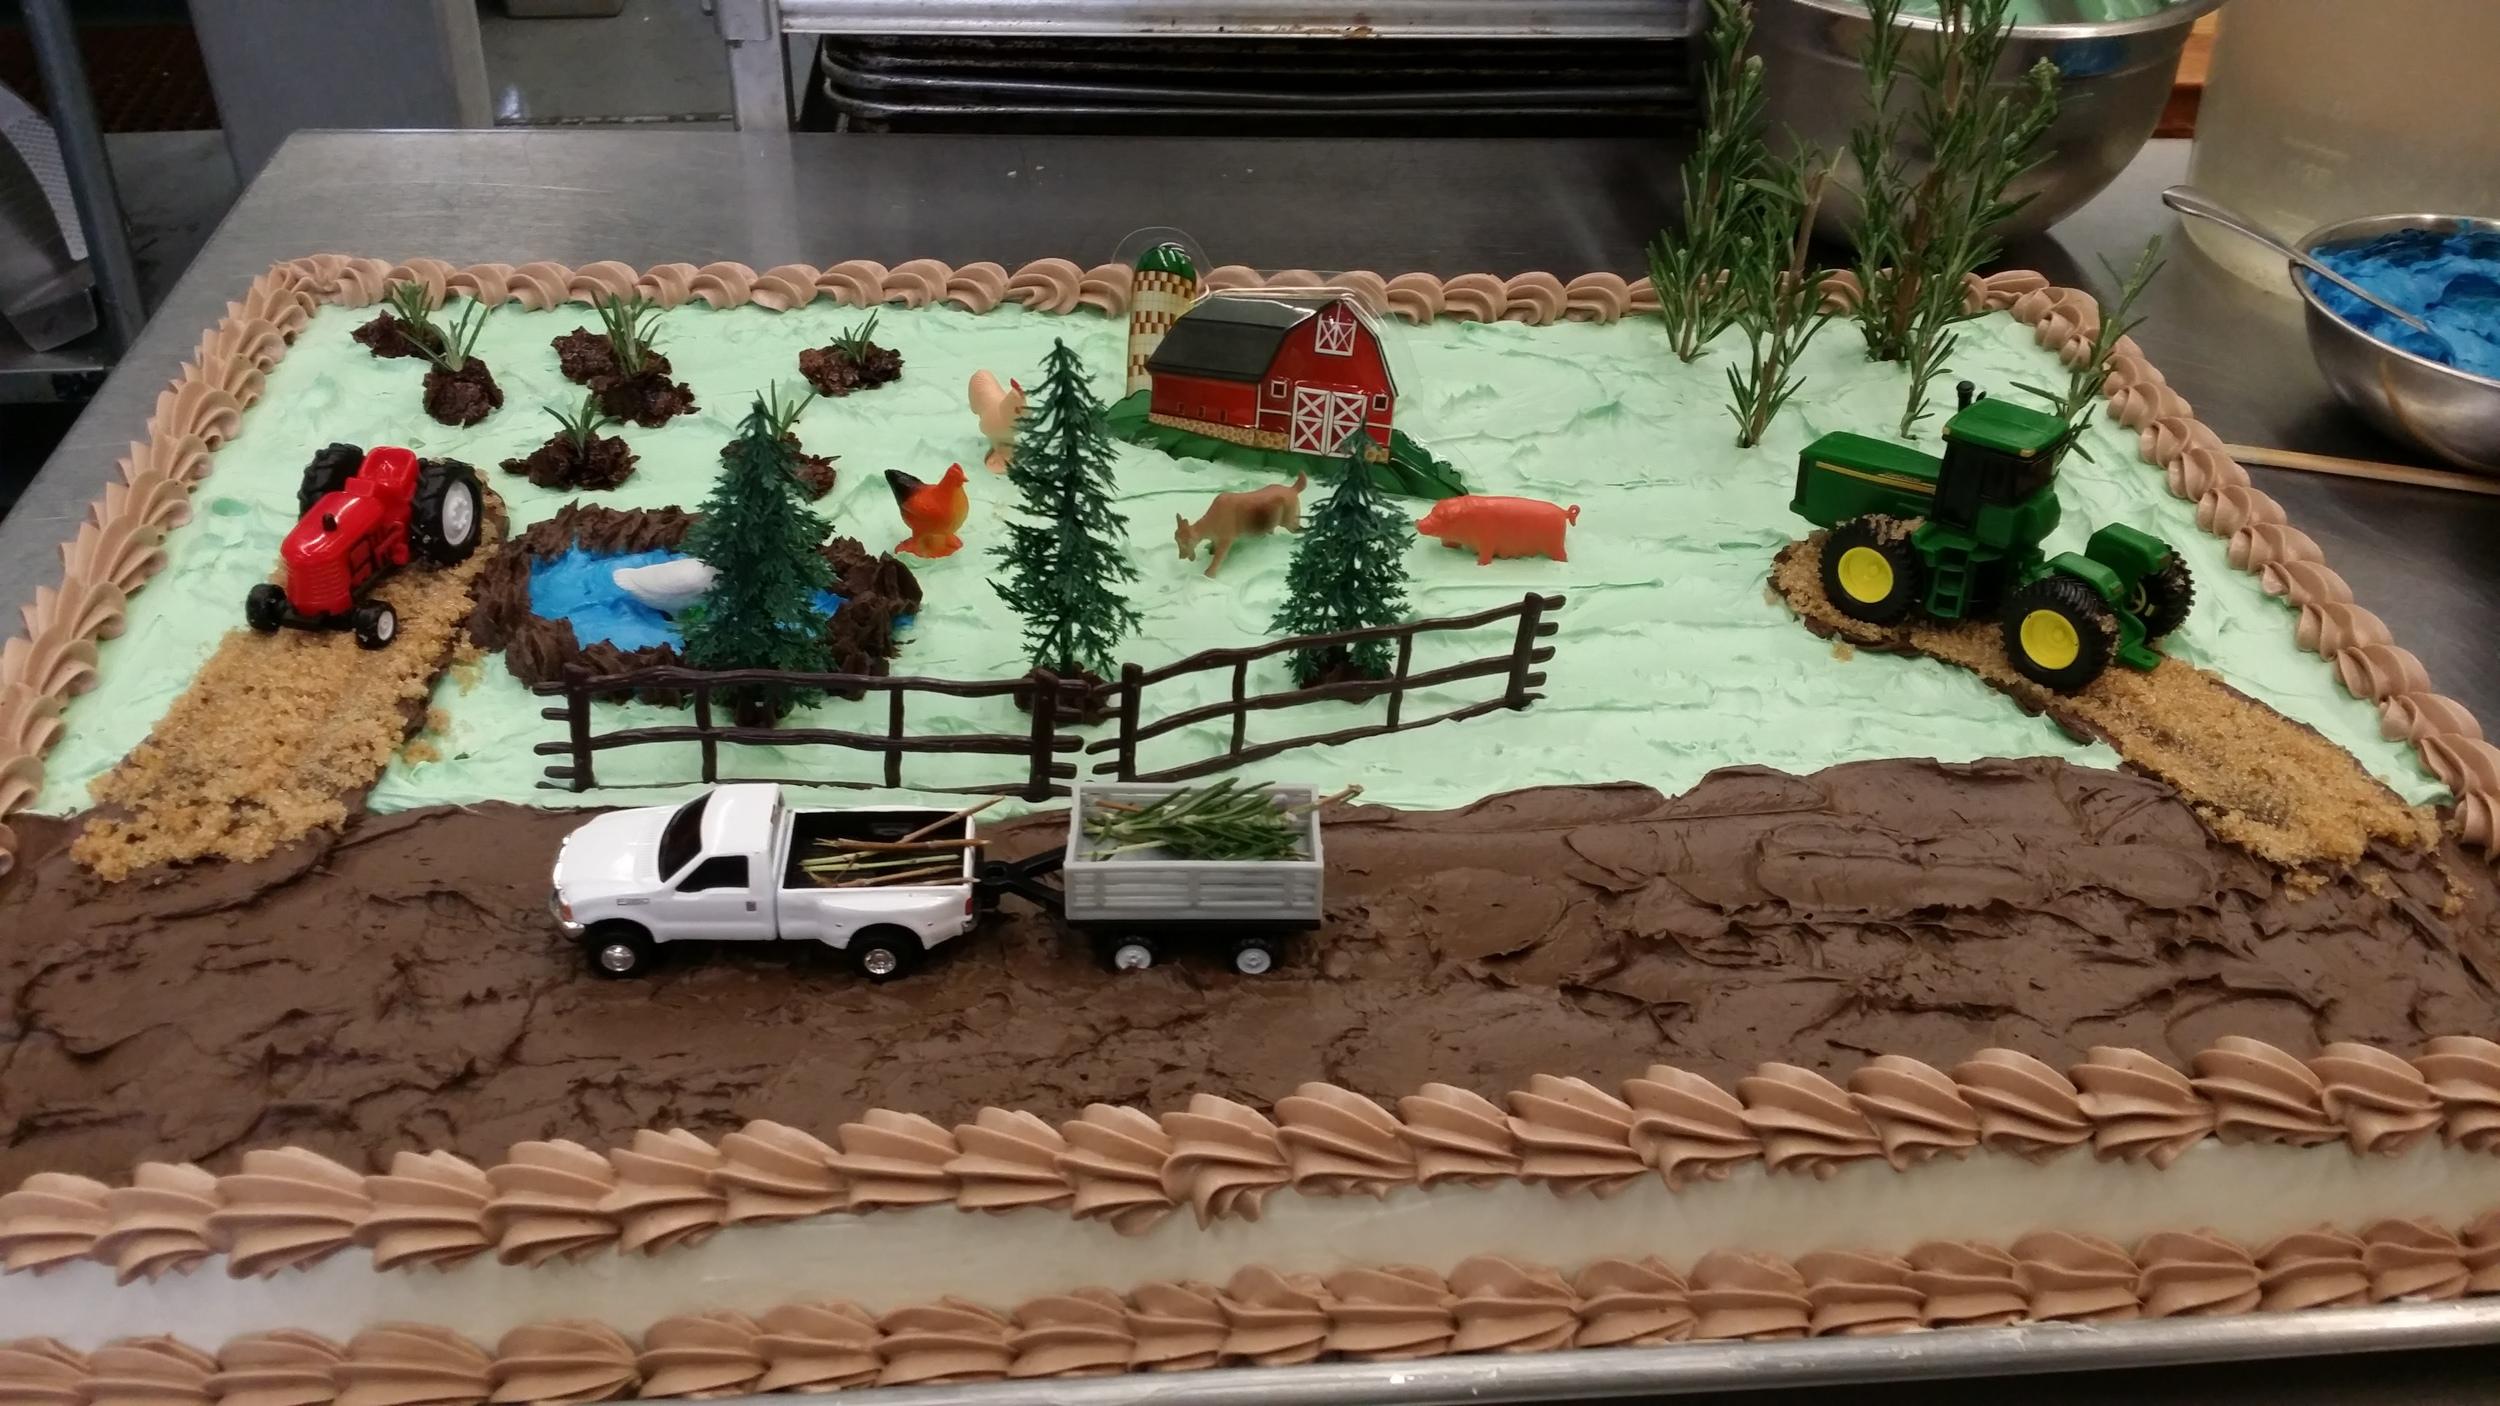 Bill Birthday Farm Cake 9-2-14